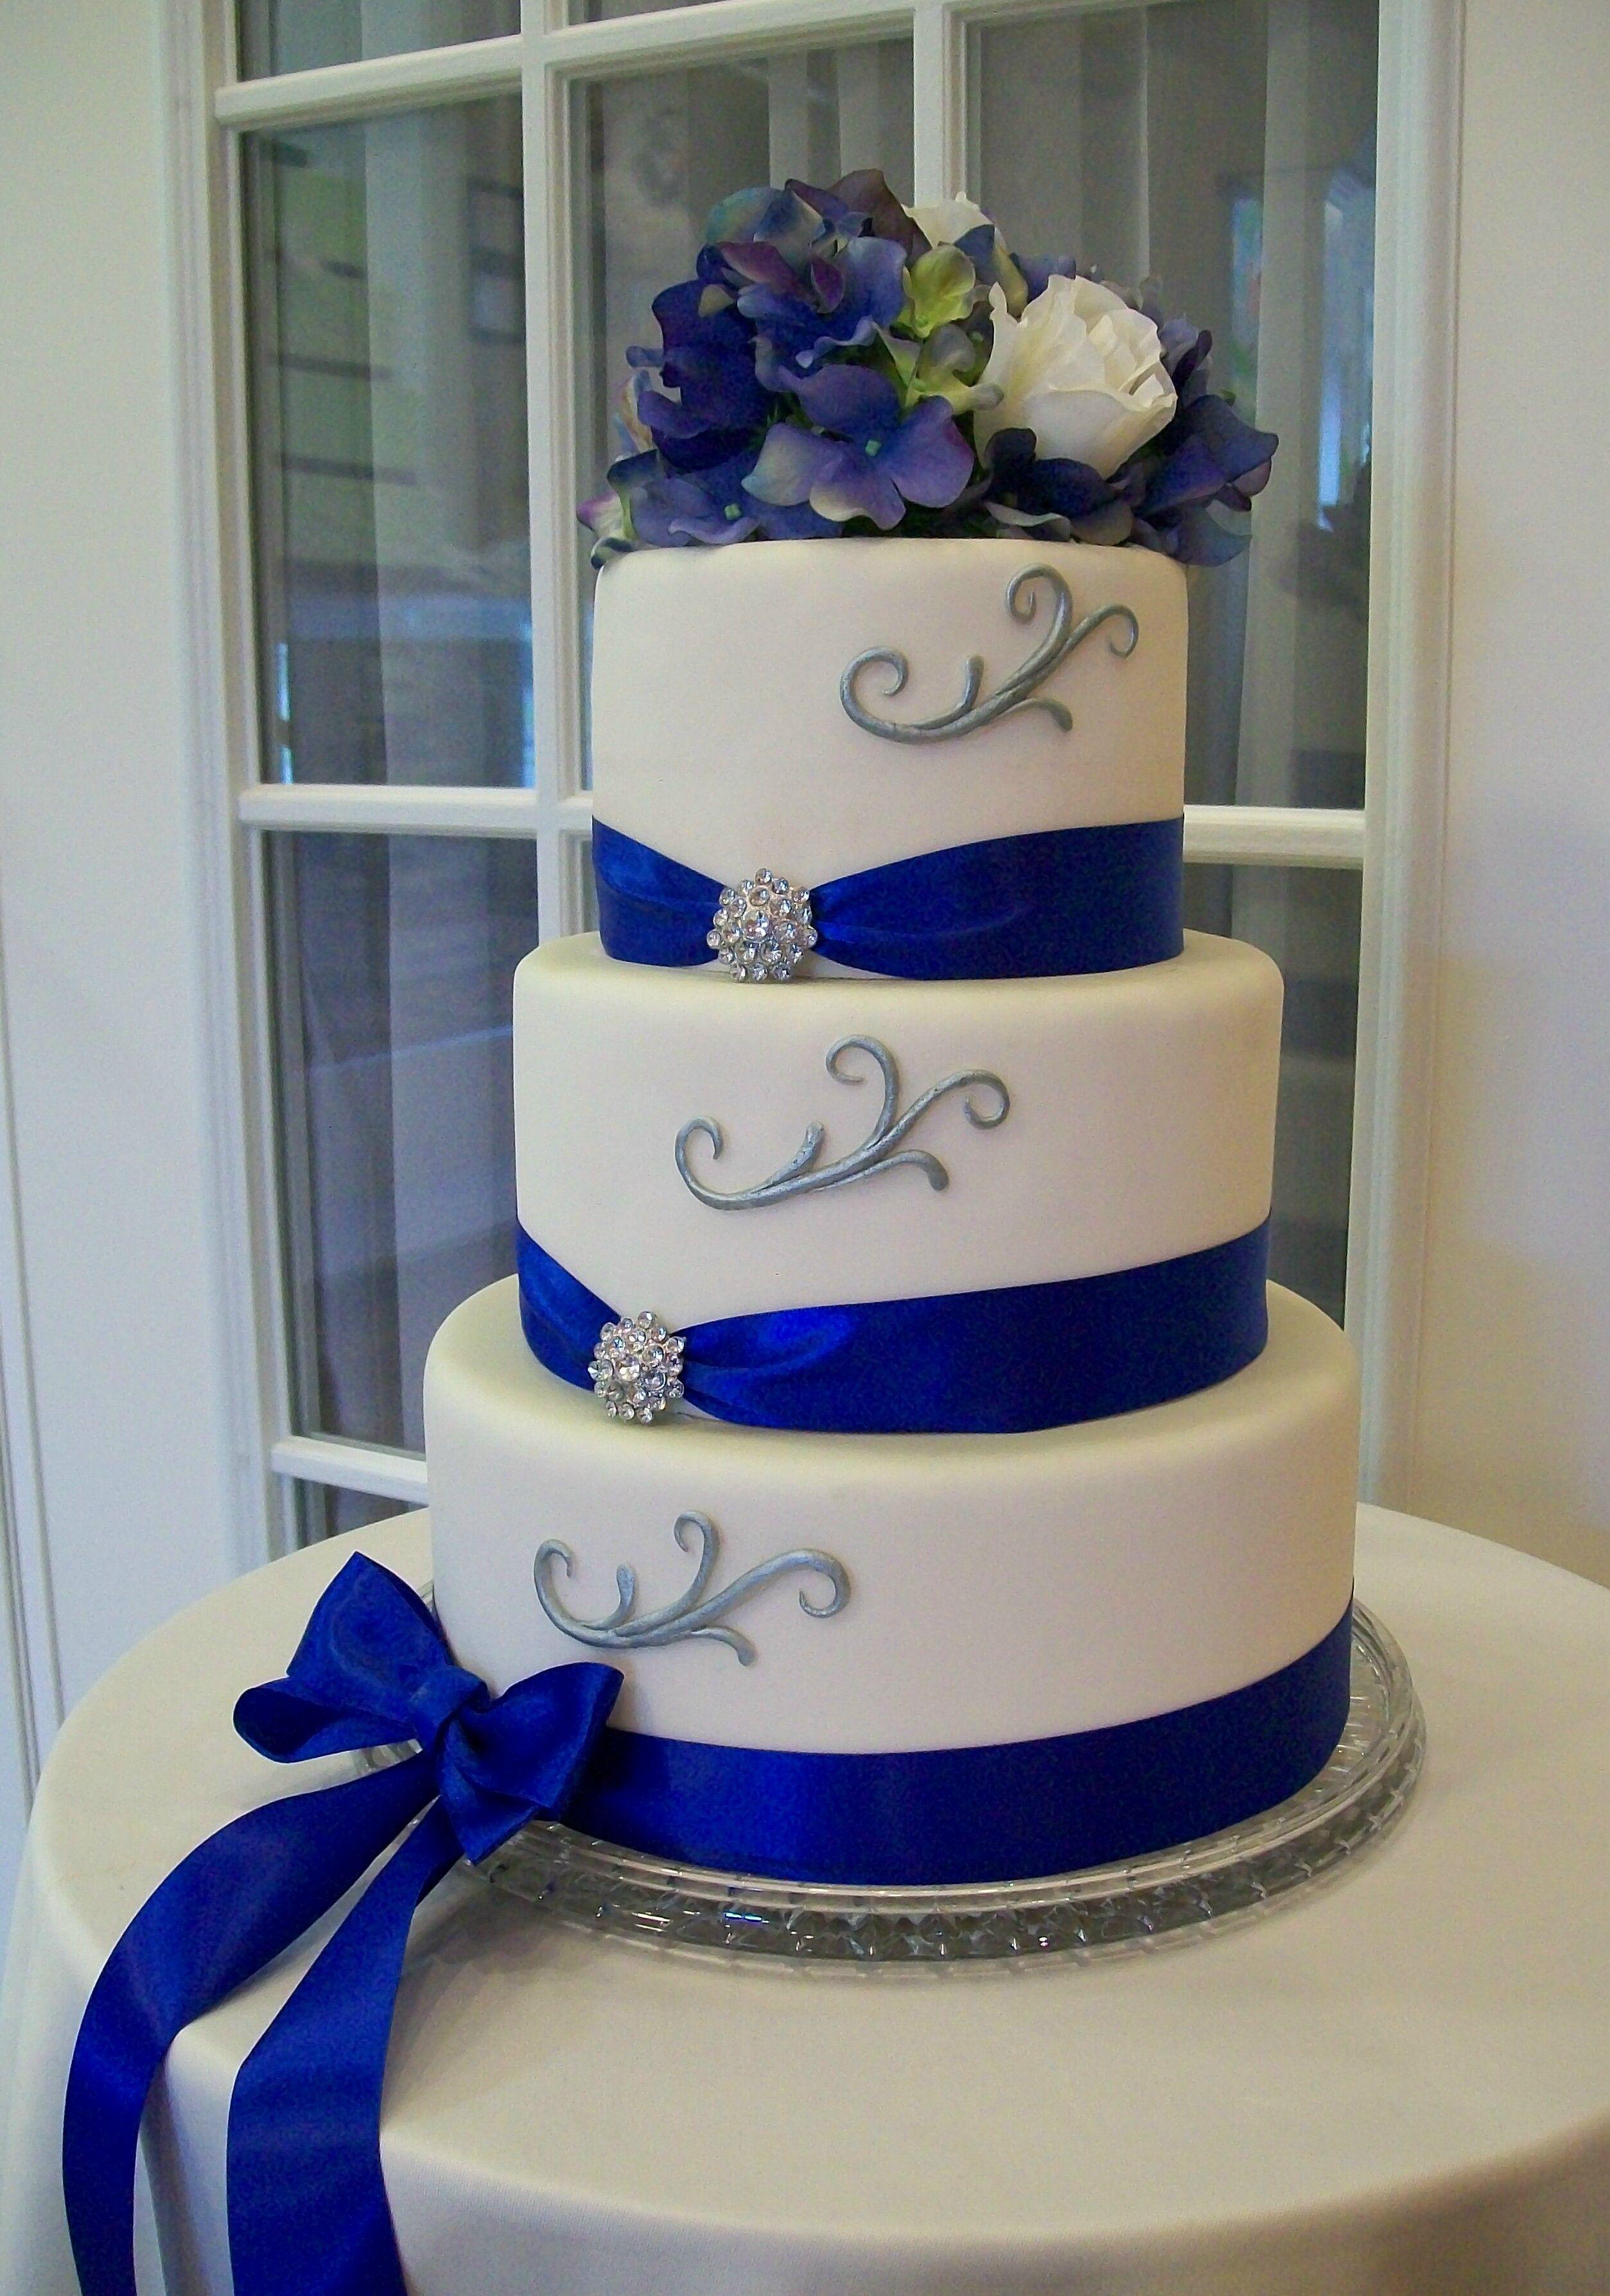 Azul Electrico Porno bridal millinery | svatební dort, svatba, dorty